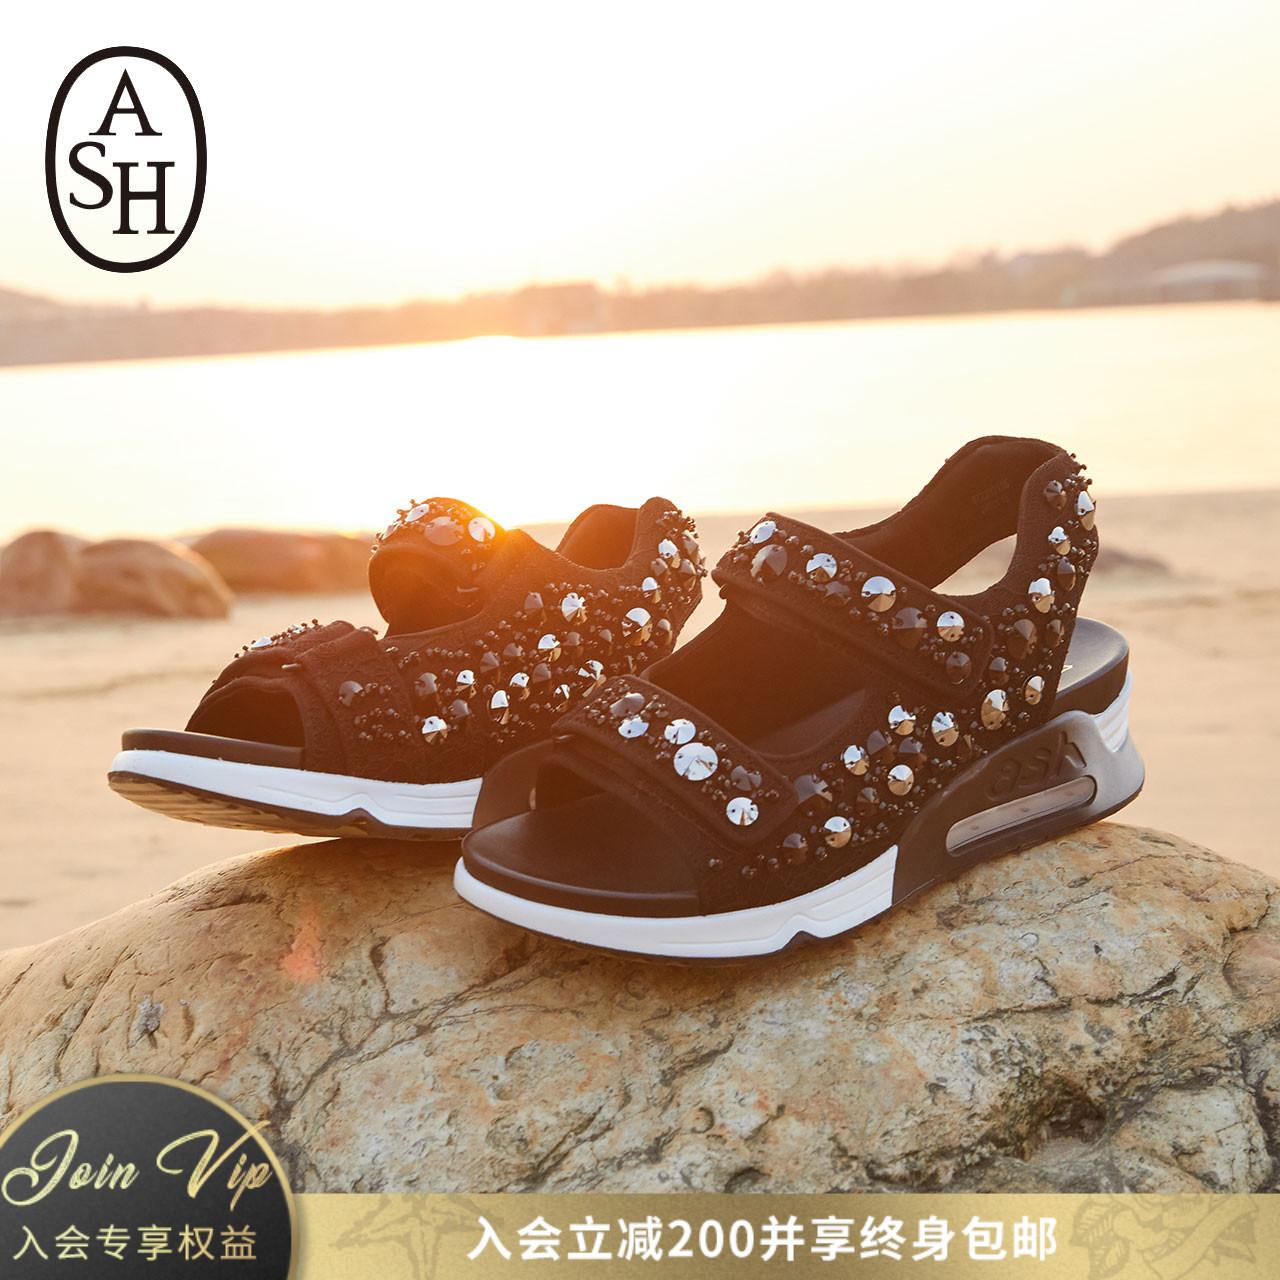 ASH女鞋2018夏季新款LULLABYBIS鉚釘運動氣墊增高涼鞋女